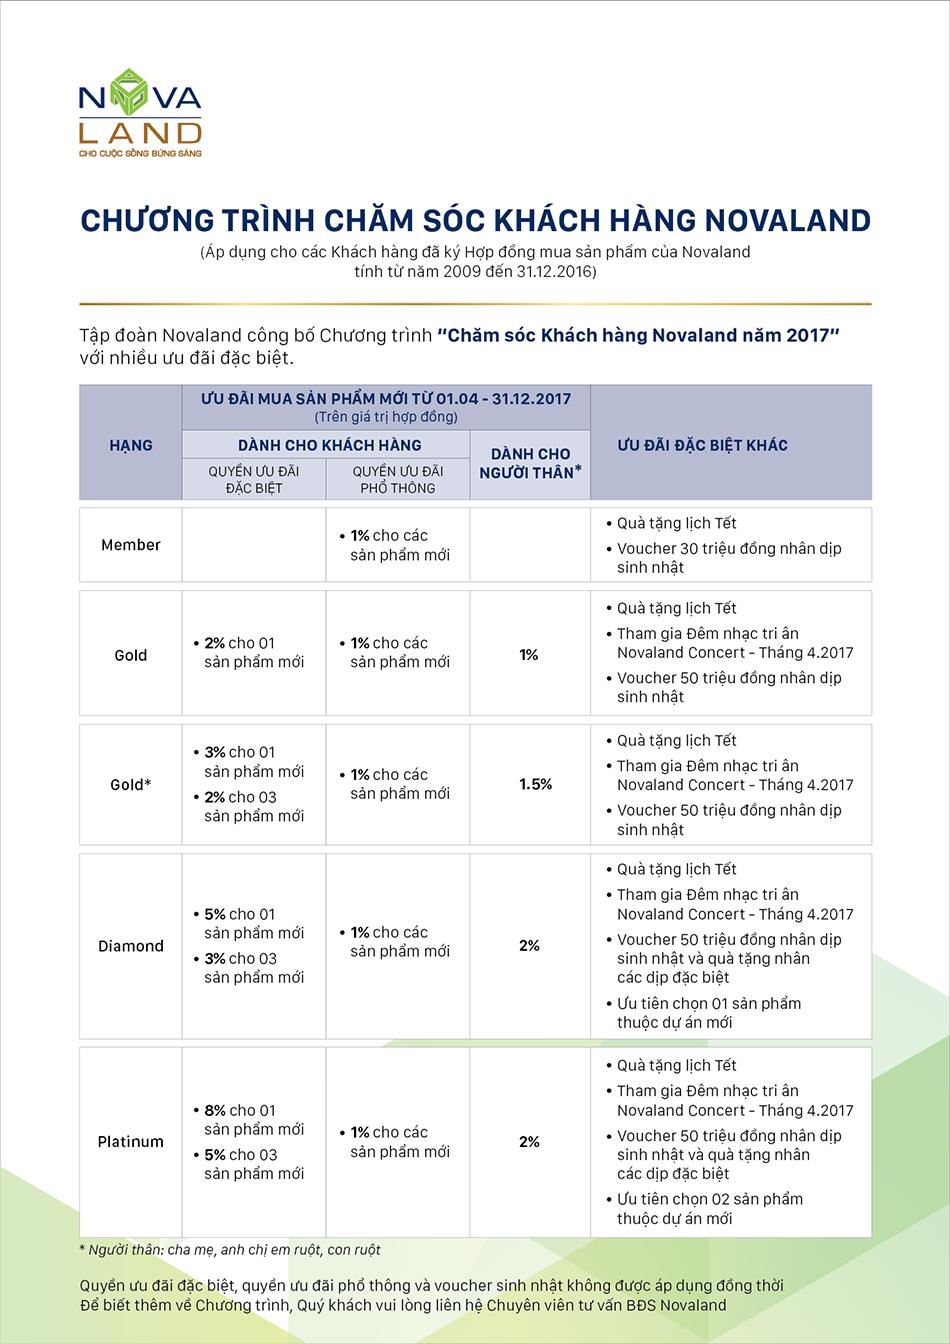 cham-soc-khach-hang-novaland